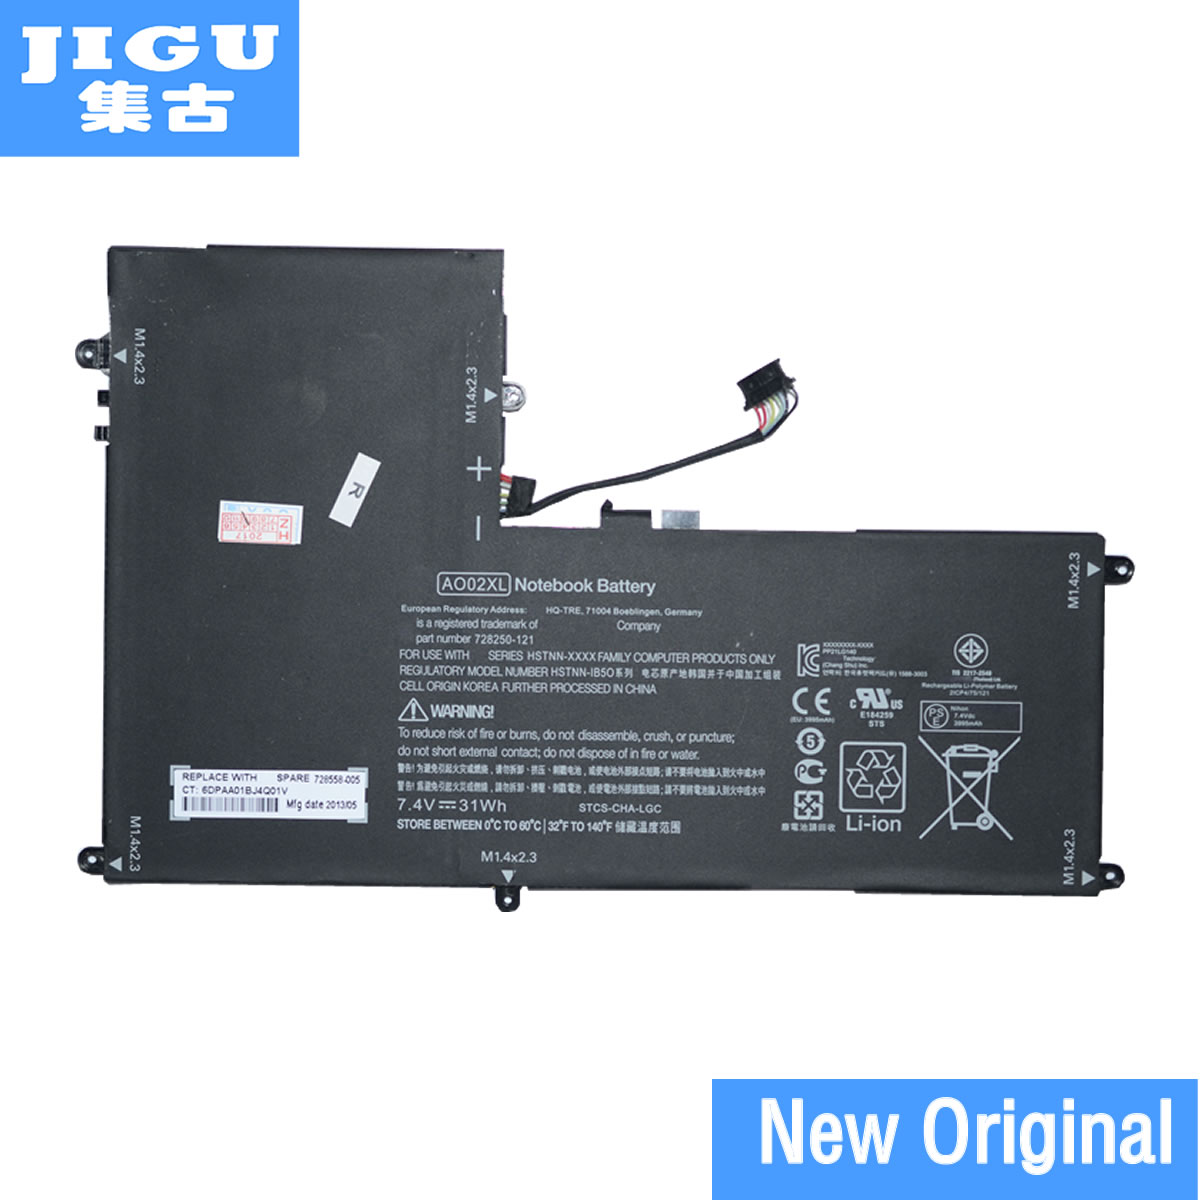 JIGU D'origine AO02XL Tablet Batterie Pour HP Pour ElitePad 1000 G2 Tablet HSTNN-LB5O HSTNN-C75C HSTNN-IB5Q 728558-005 728250- 421